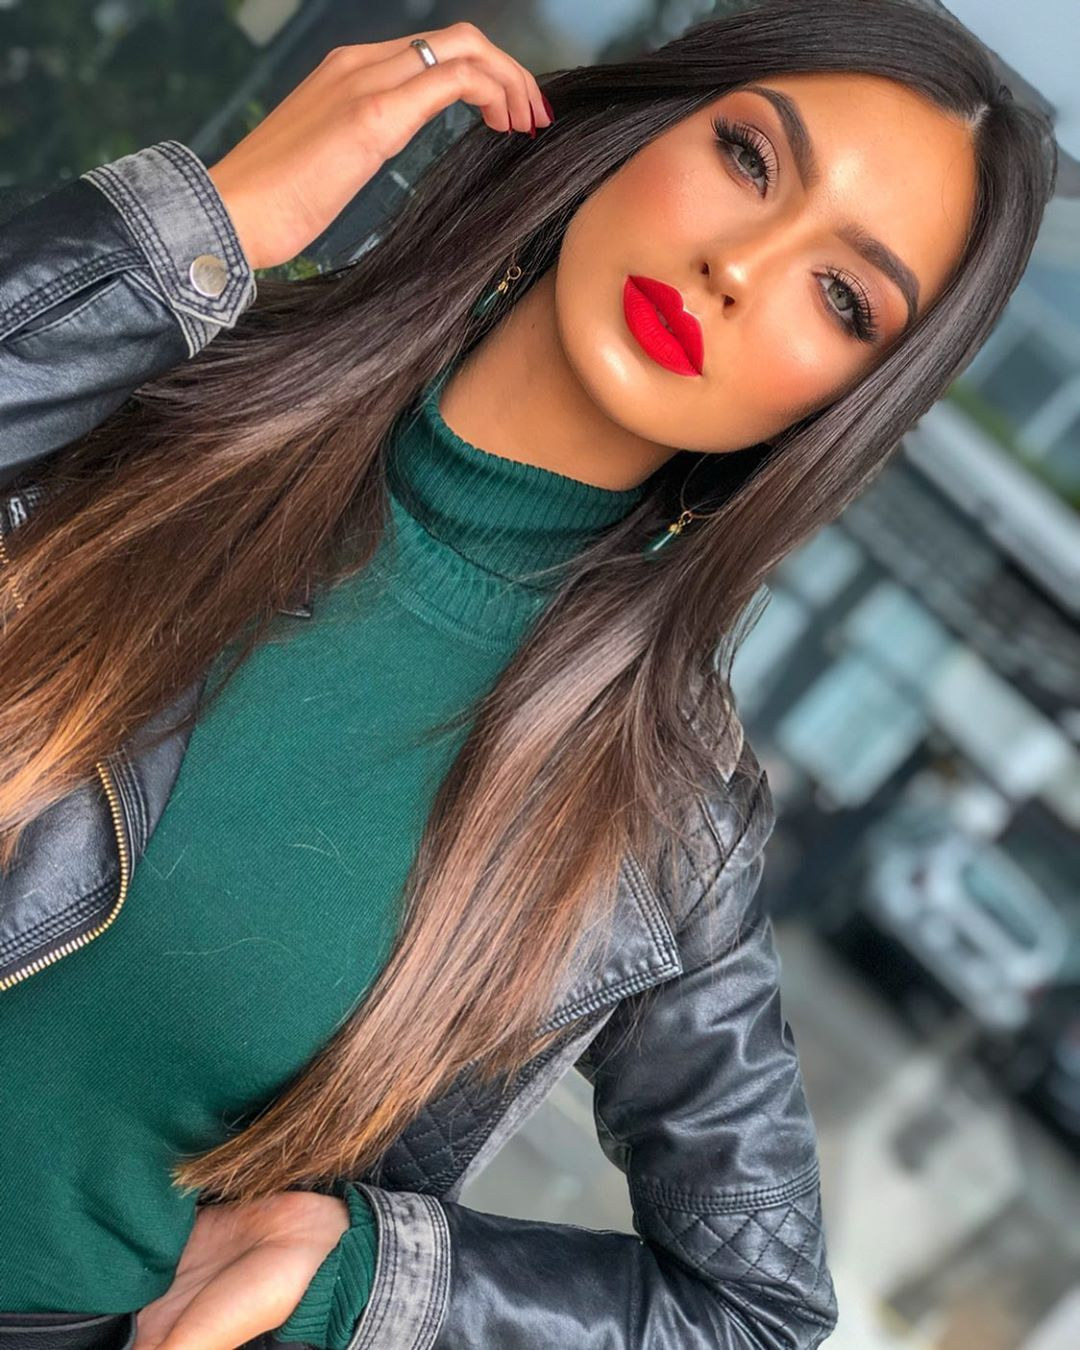 bianca scheren, top 5 de miss brasil universo 2019. - Página 11 Alex-737